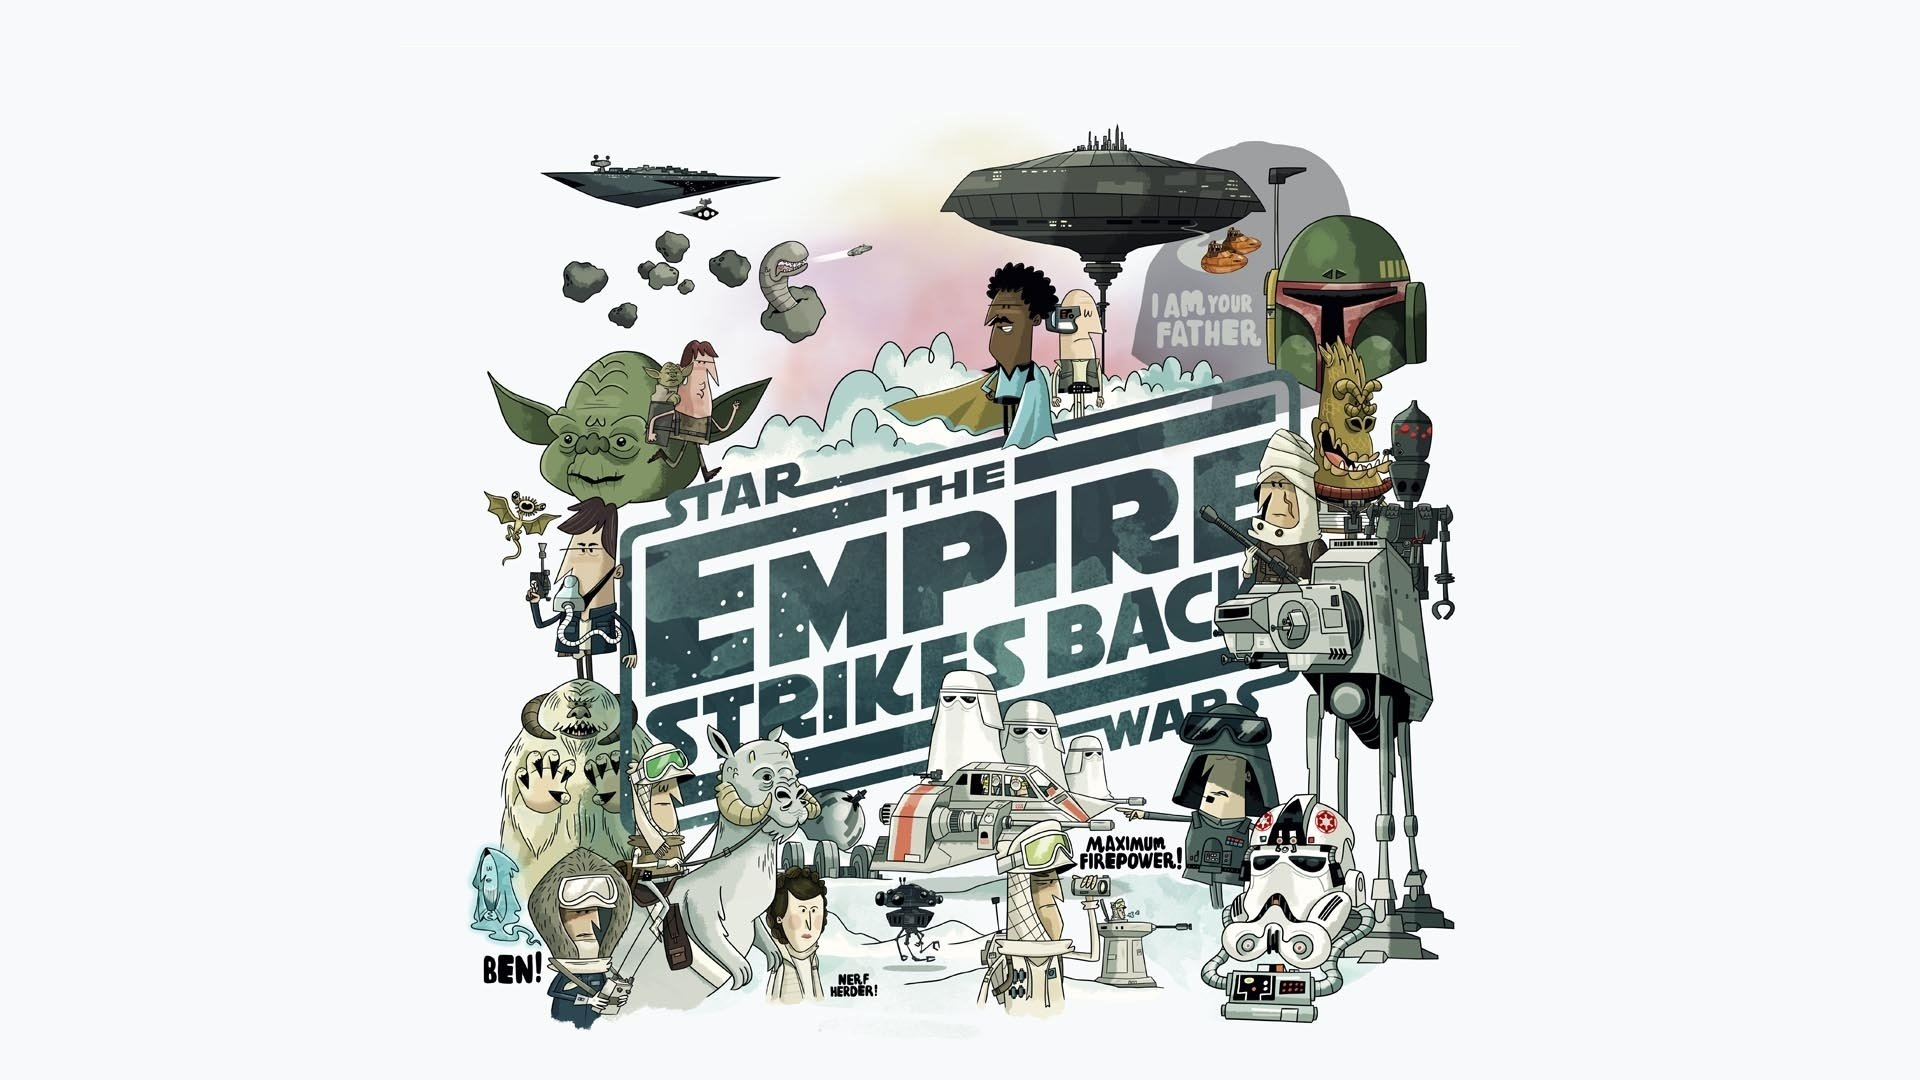 Star Wars Episode V: The Empire Strikes Back HD Wallpaper